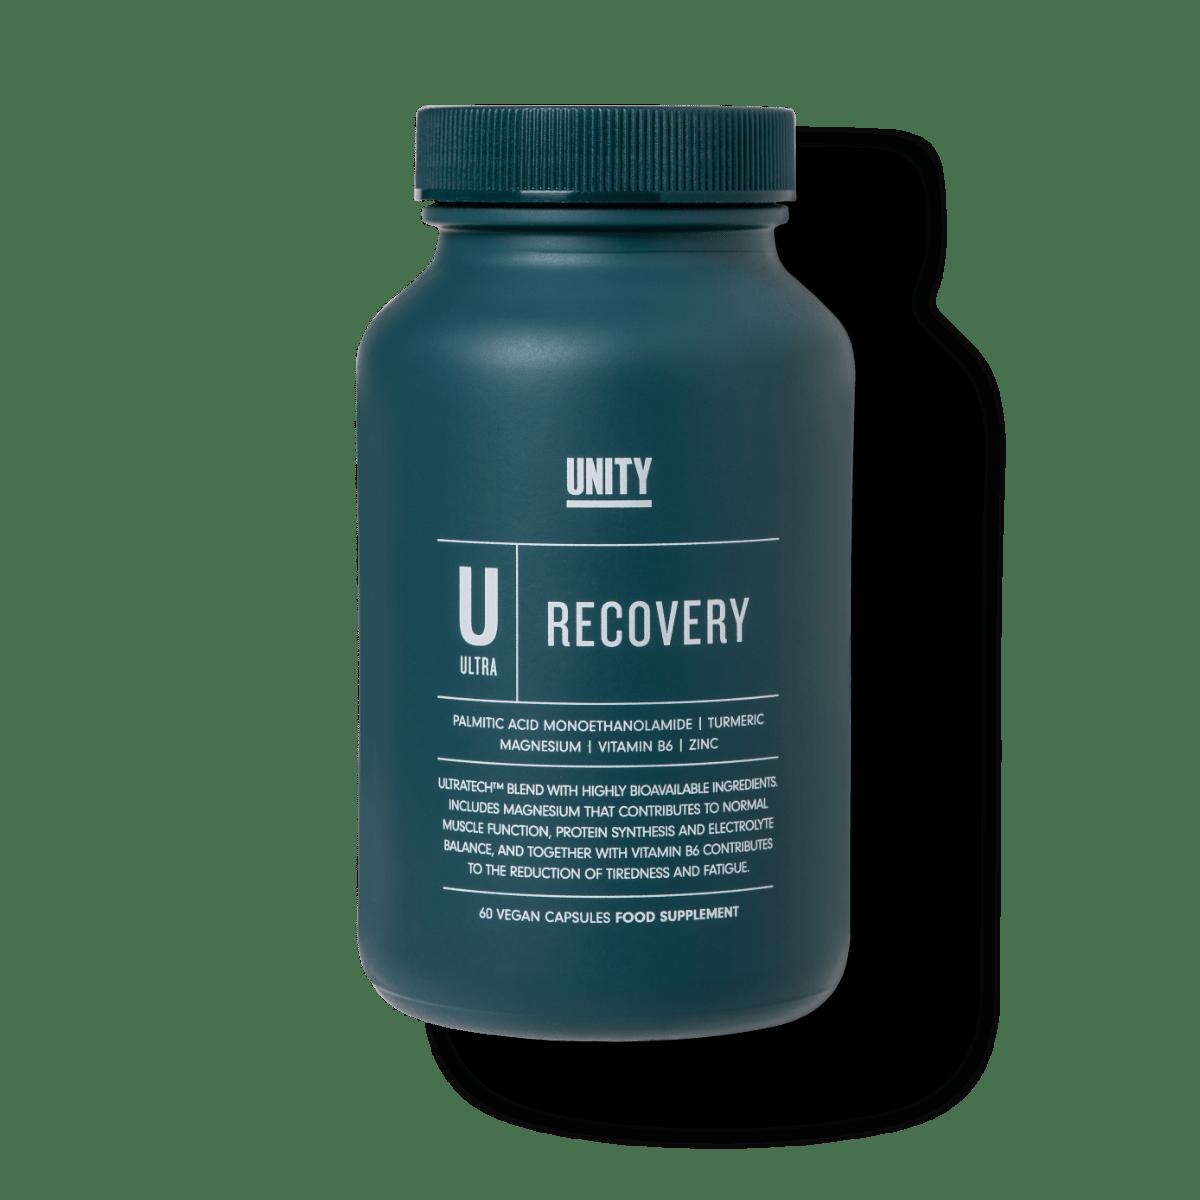 U ULTRA Recovery